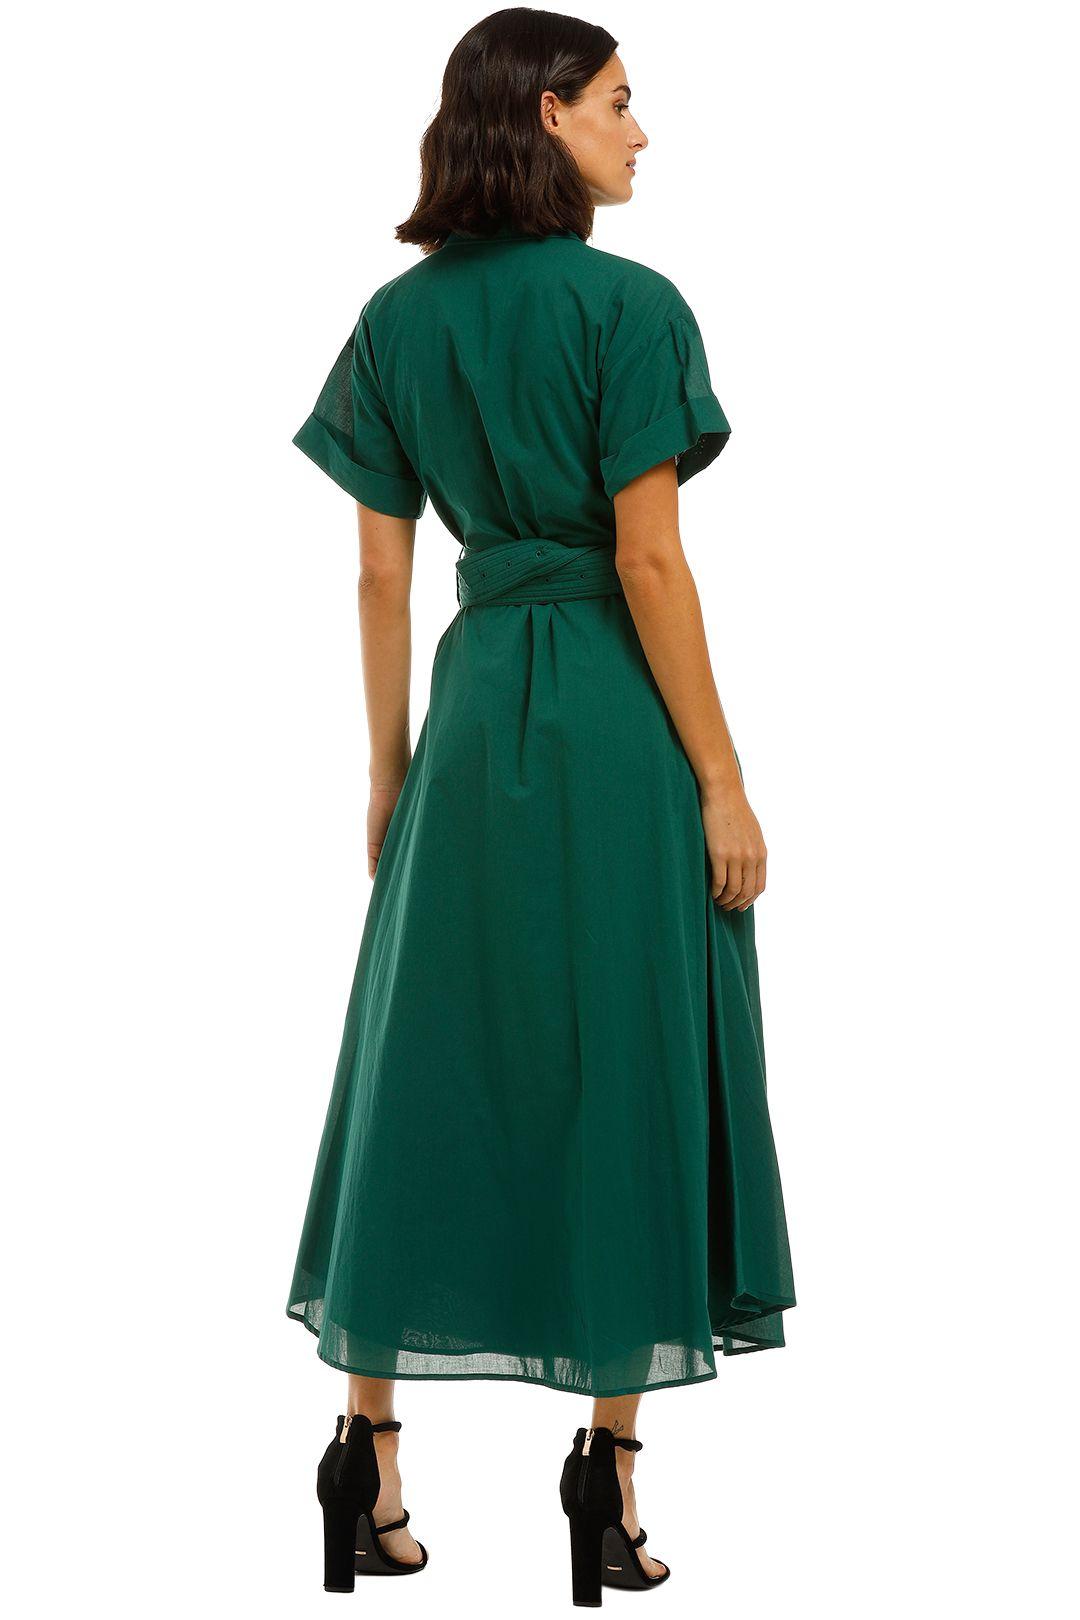 Camilla-and-Marc-Maya-Dress-Emerald-Green-Back